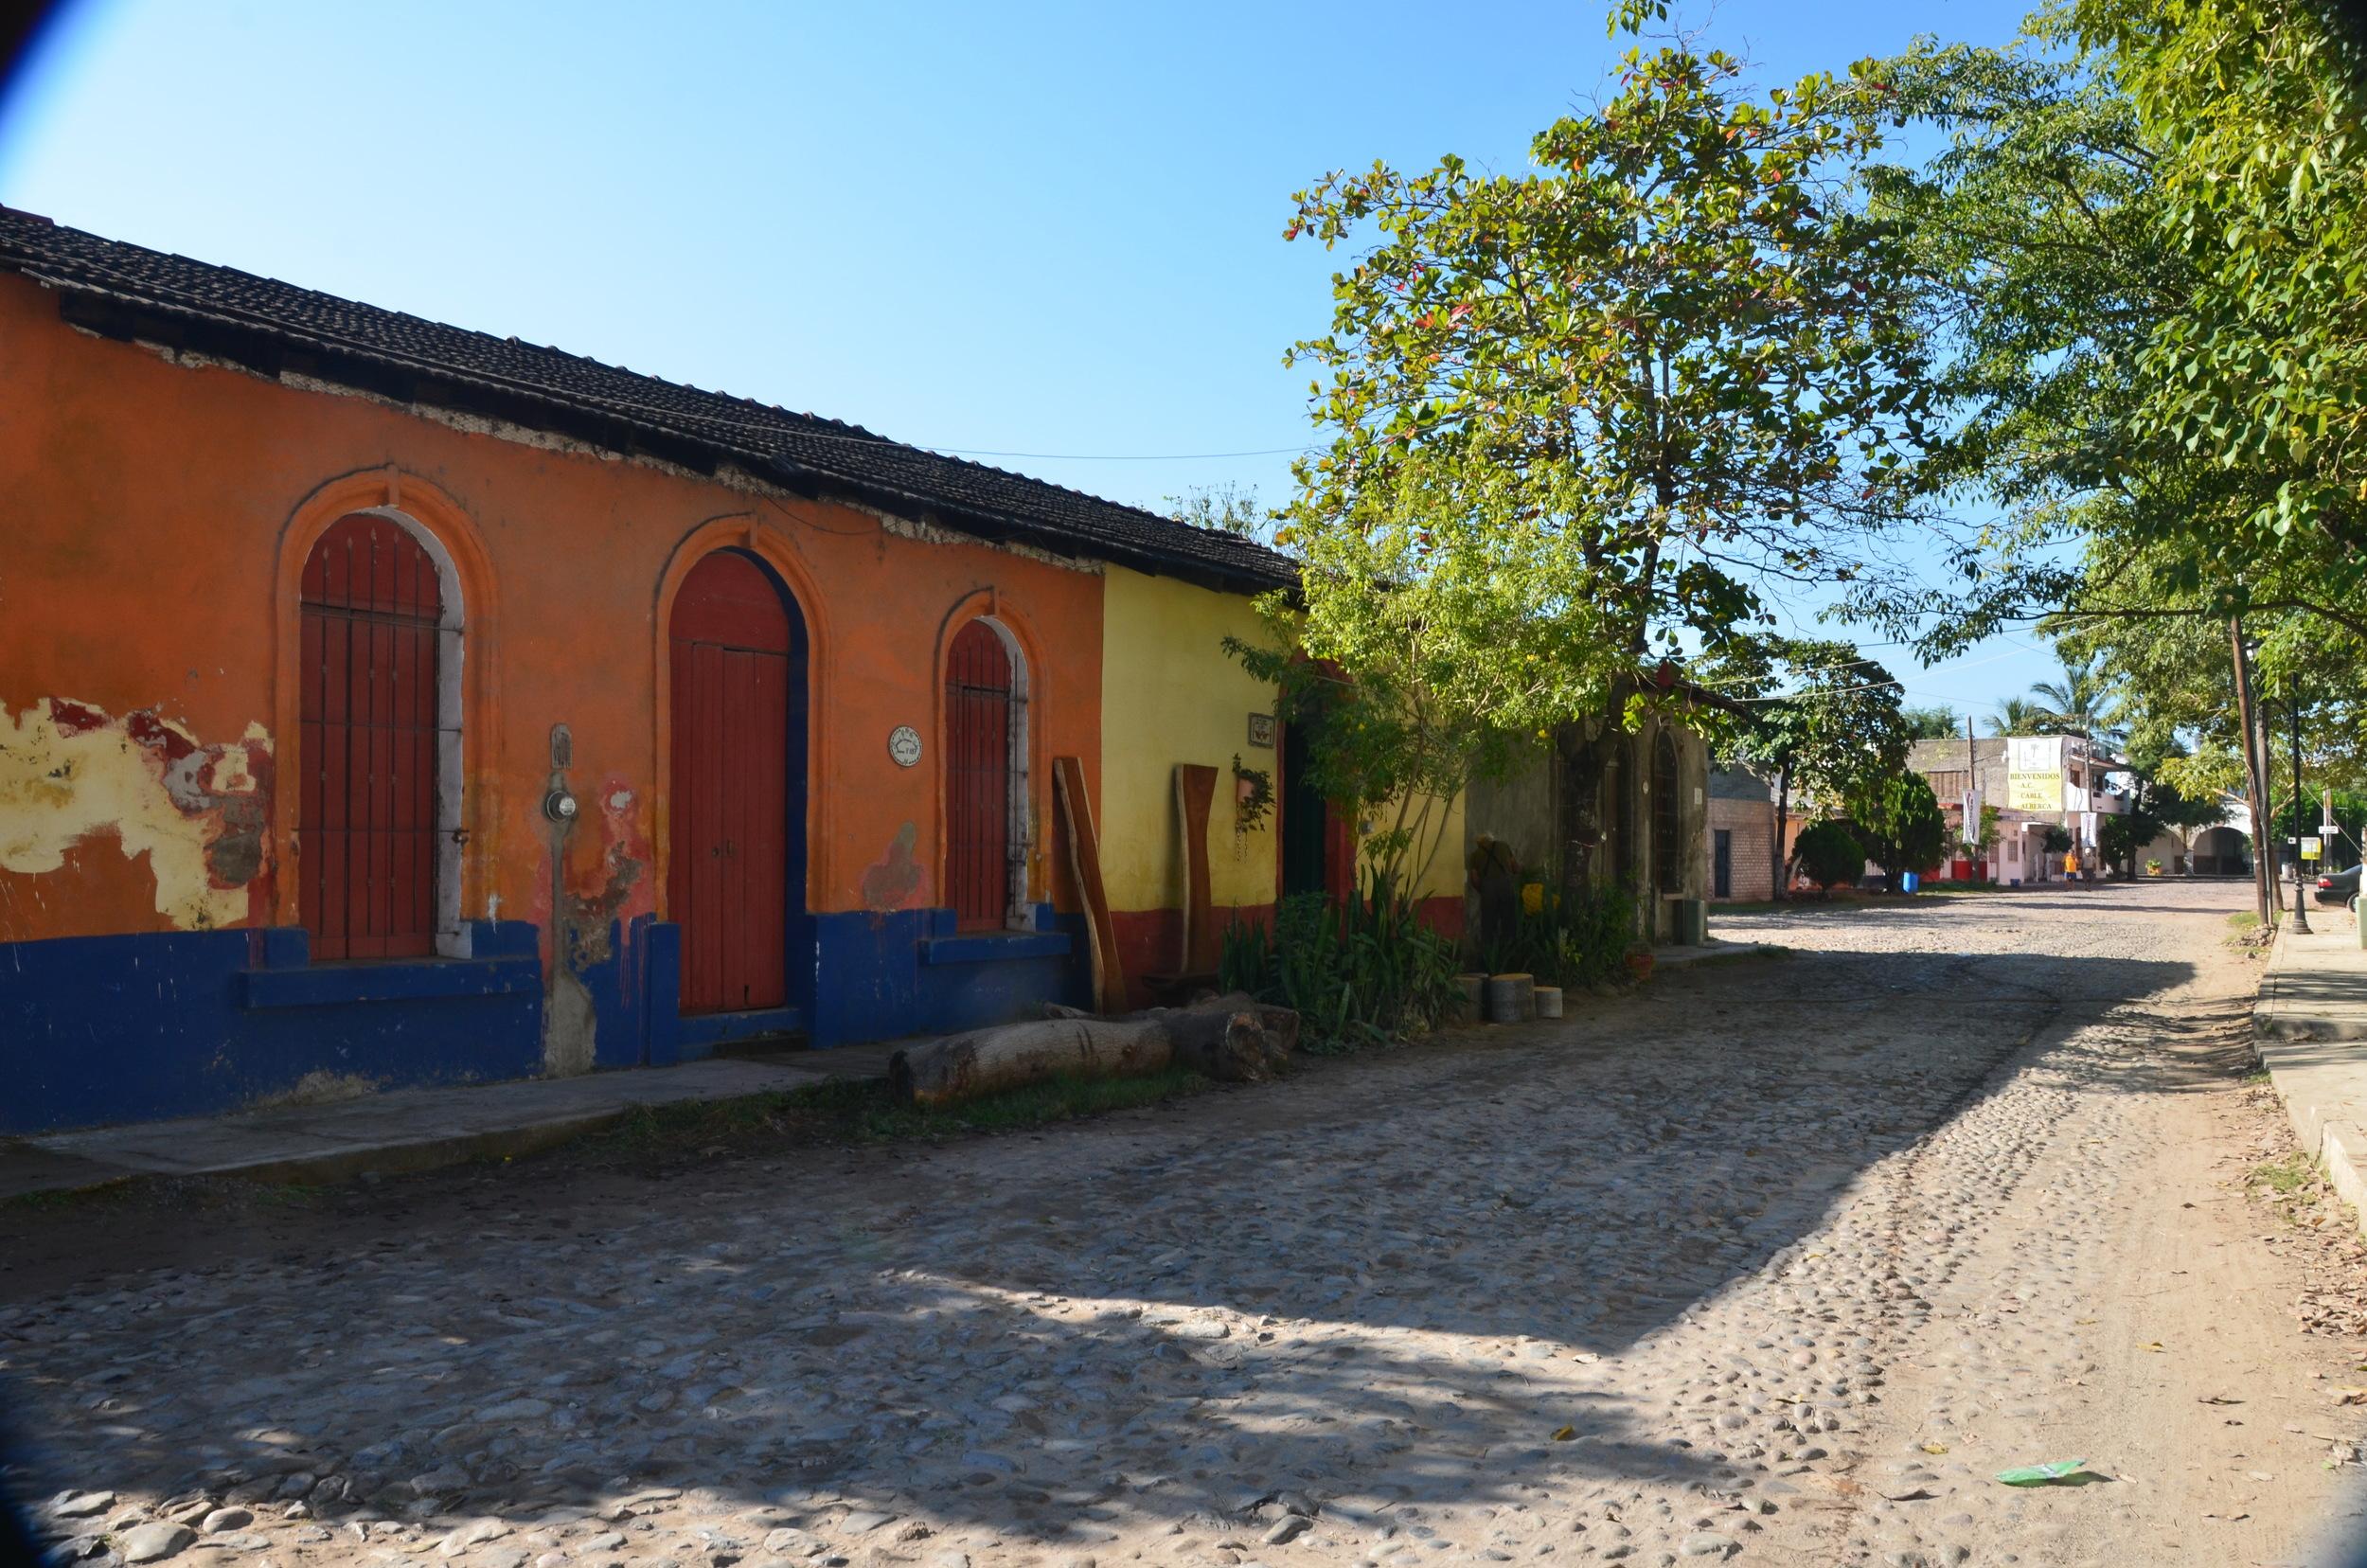 The streets of San Blas